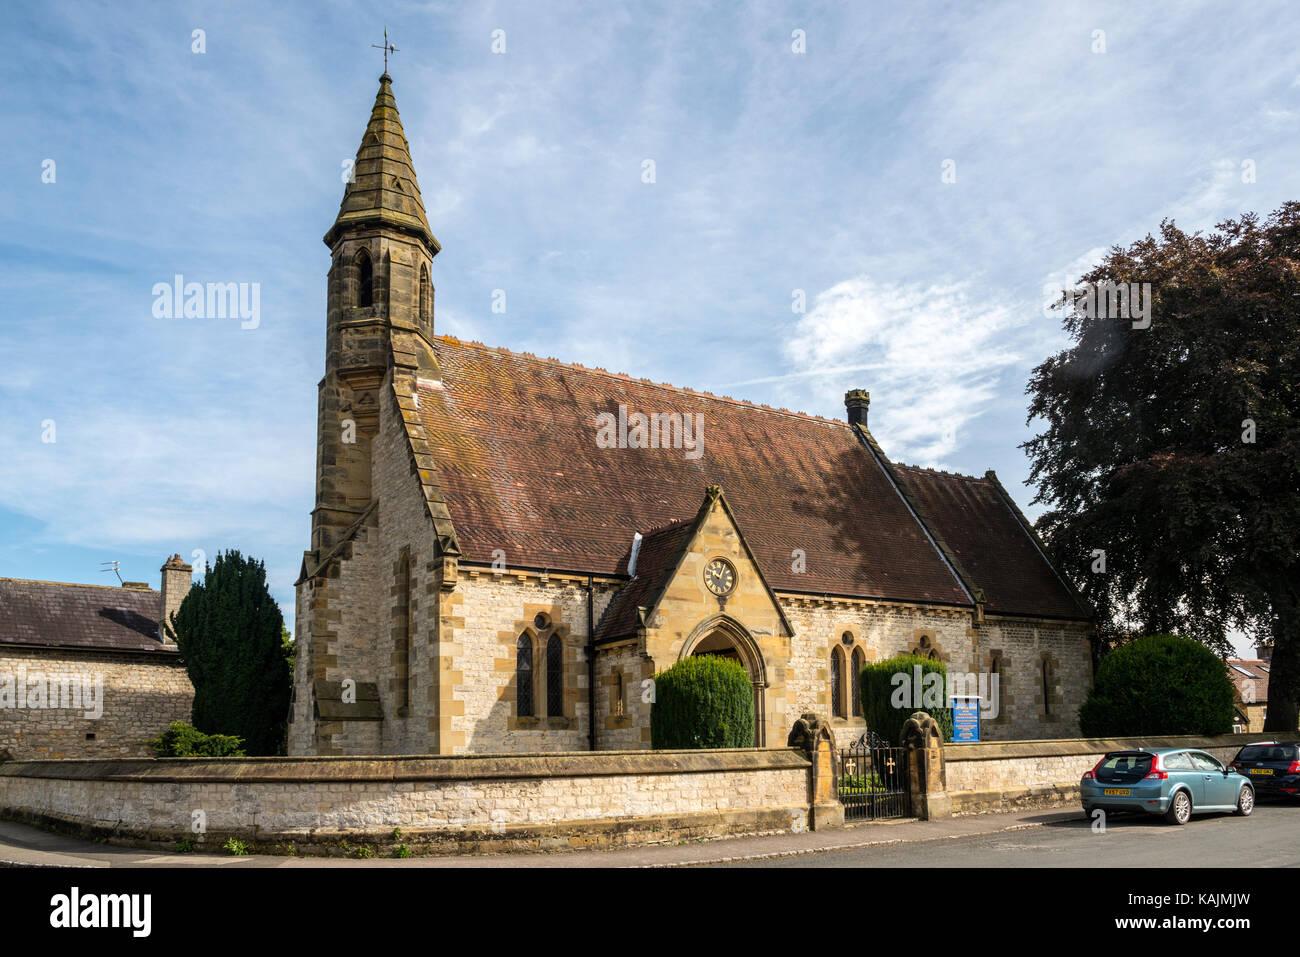 St Saviour's Church, Harome, North Yorkshire - Stock Image